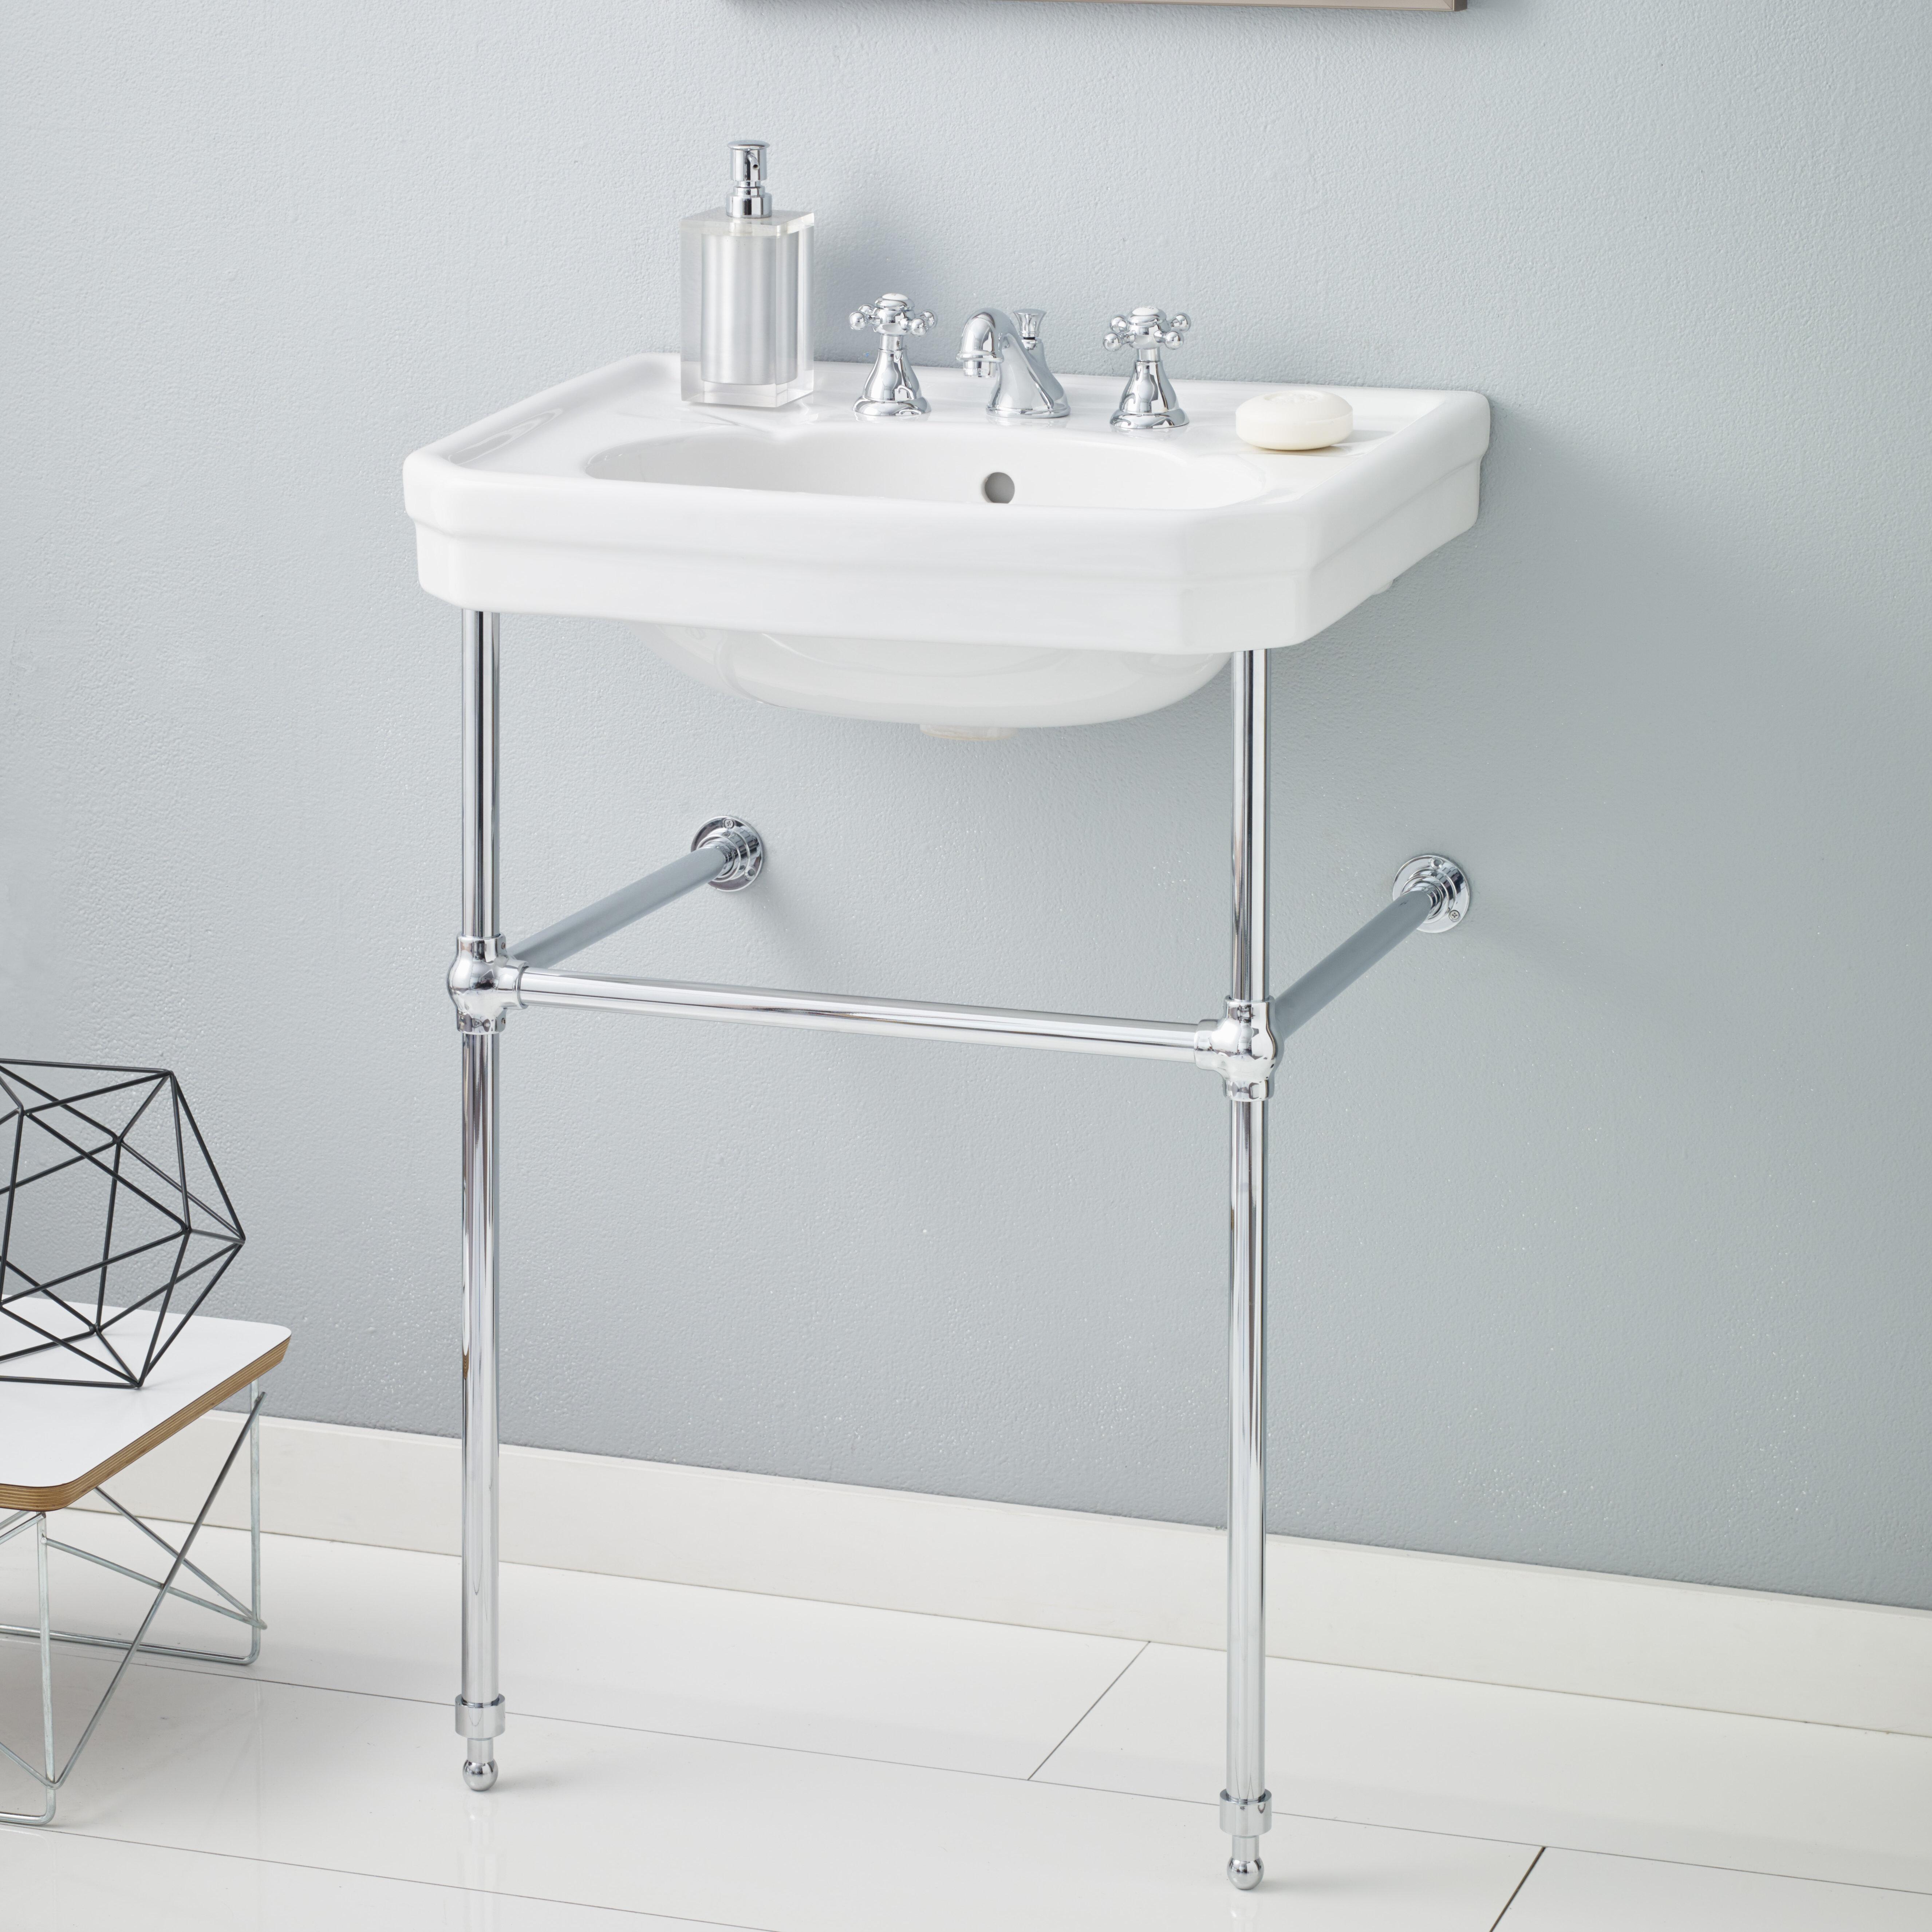 Cheviotproducts Mayfair Metal 25 Console Bathroom Sink With Overflow Reviews Wayfair